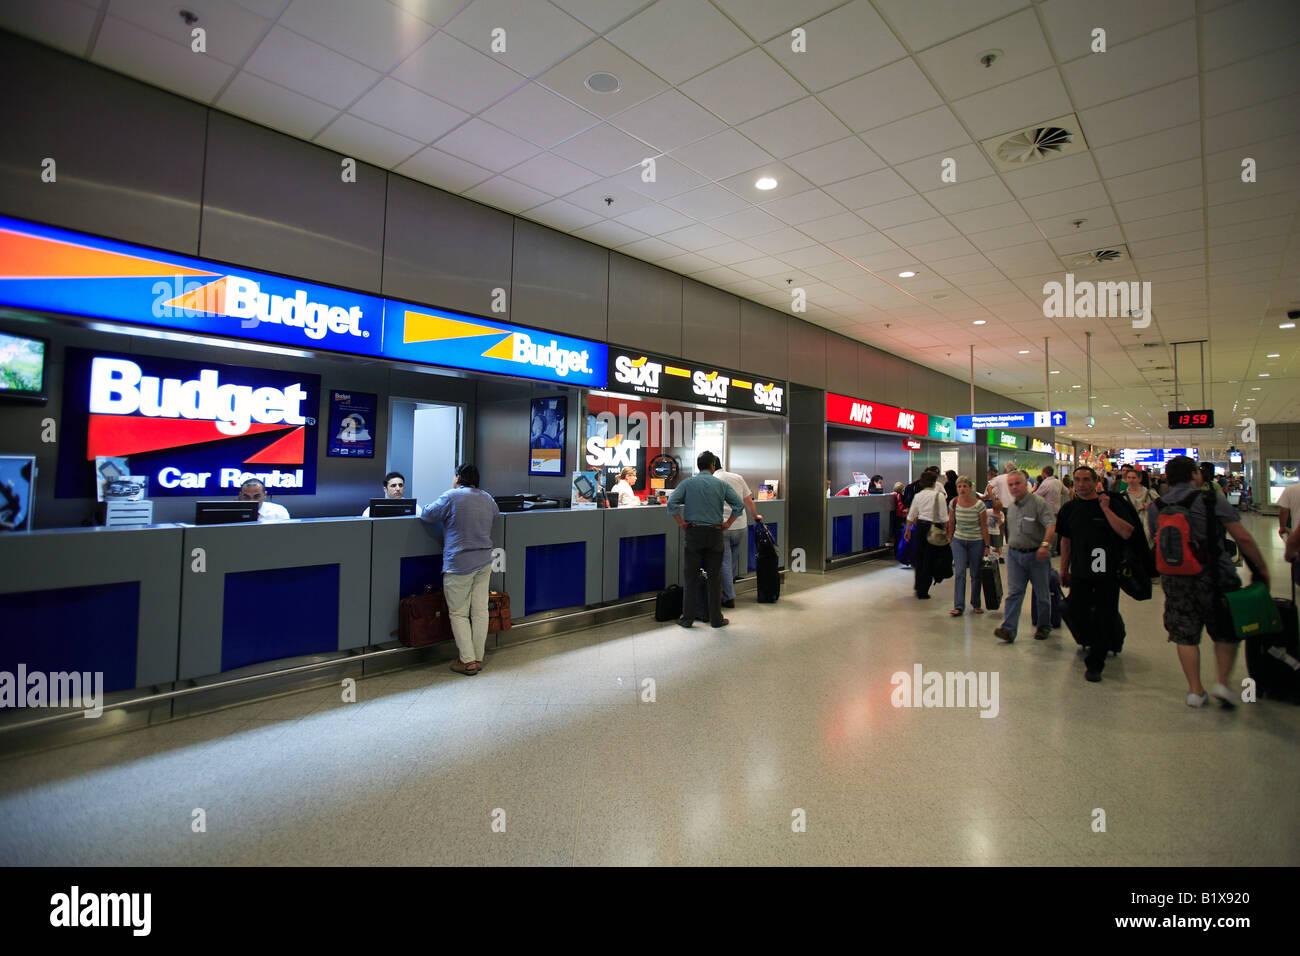 Rent A Car Eleftherios Venizelos Airport